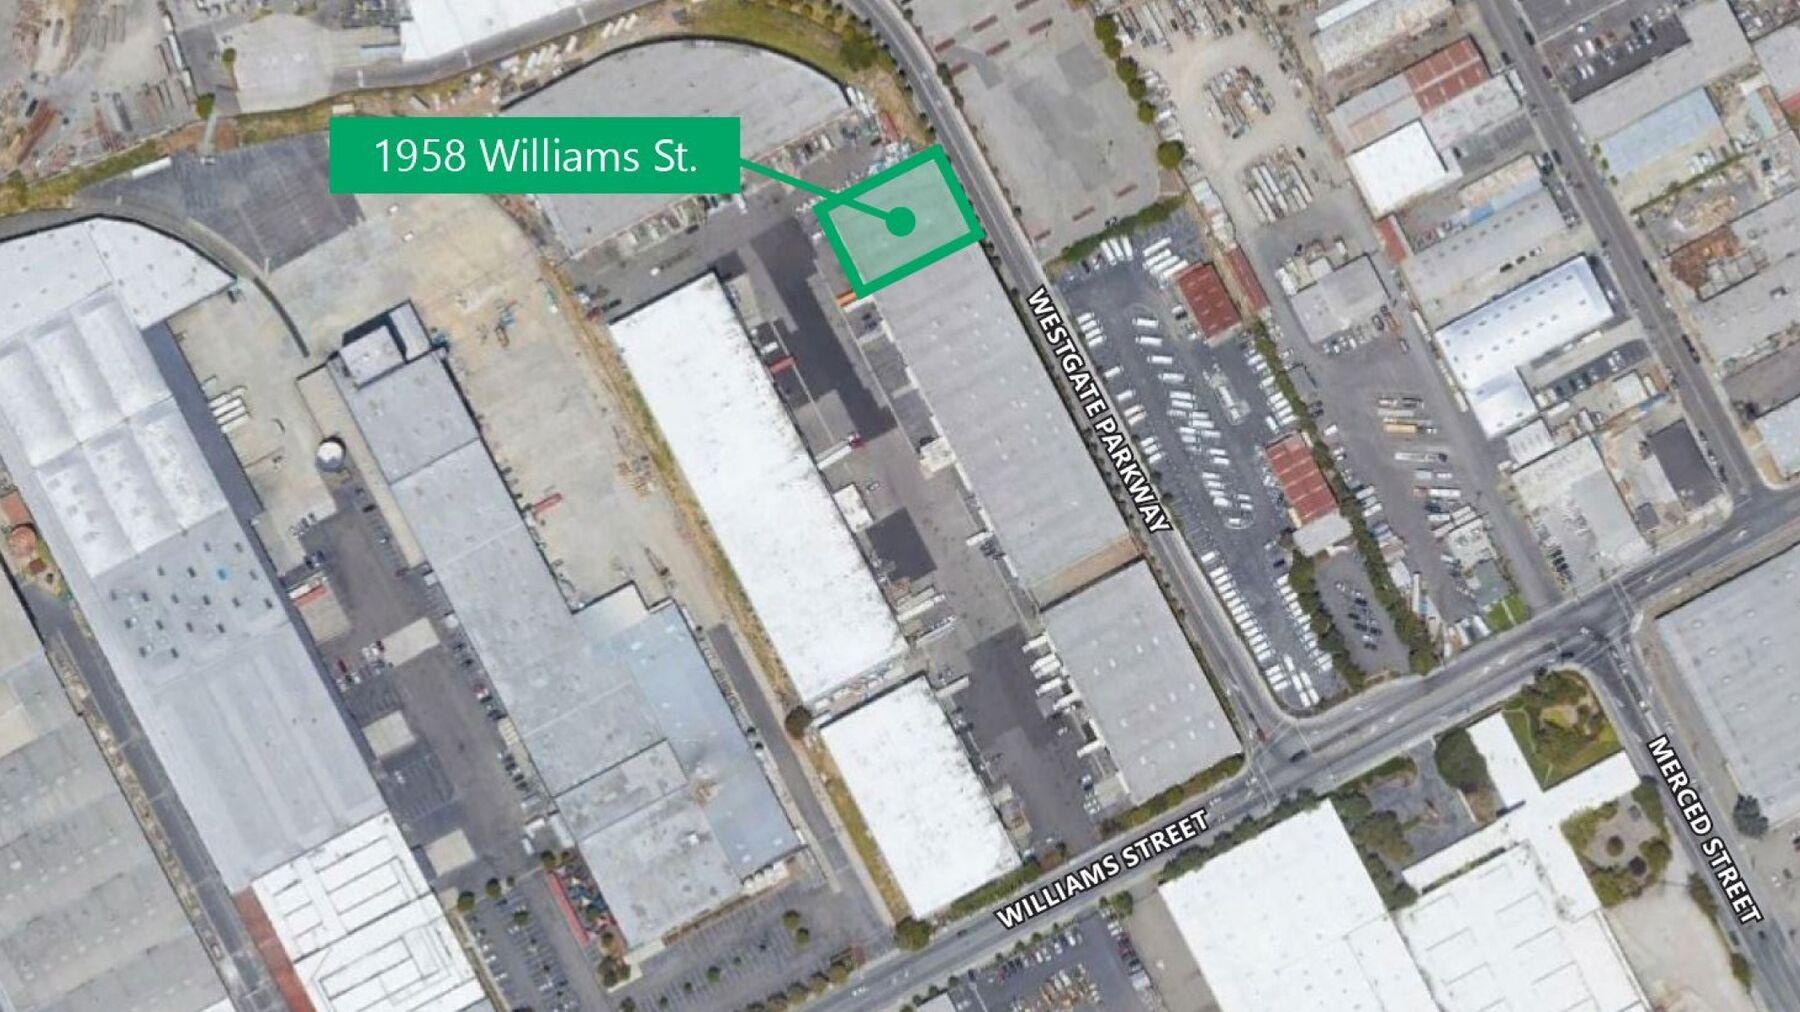 DPM-1958-Williams-St-San-Leandro-20-eba03203-15-000-SF-Hero-Aerial.jpg